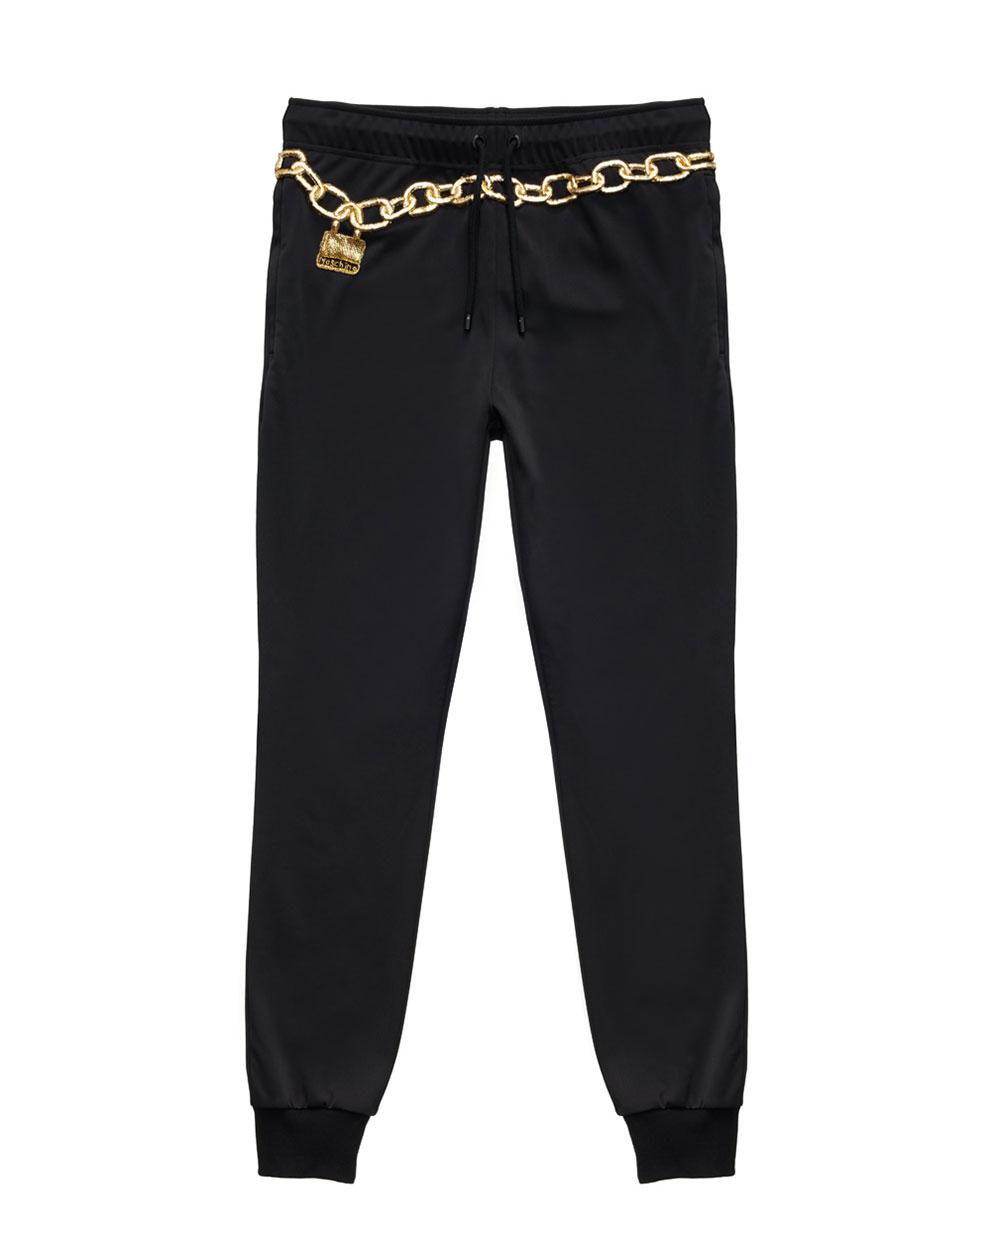 Svarta mjukisbyxor med guldbrodyr Moschino x H&M